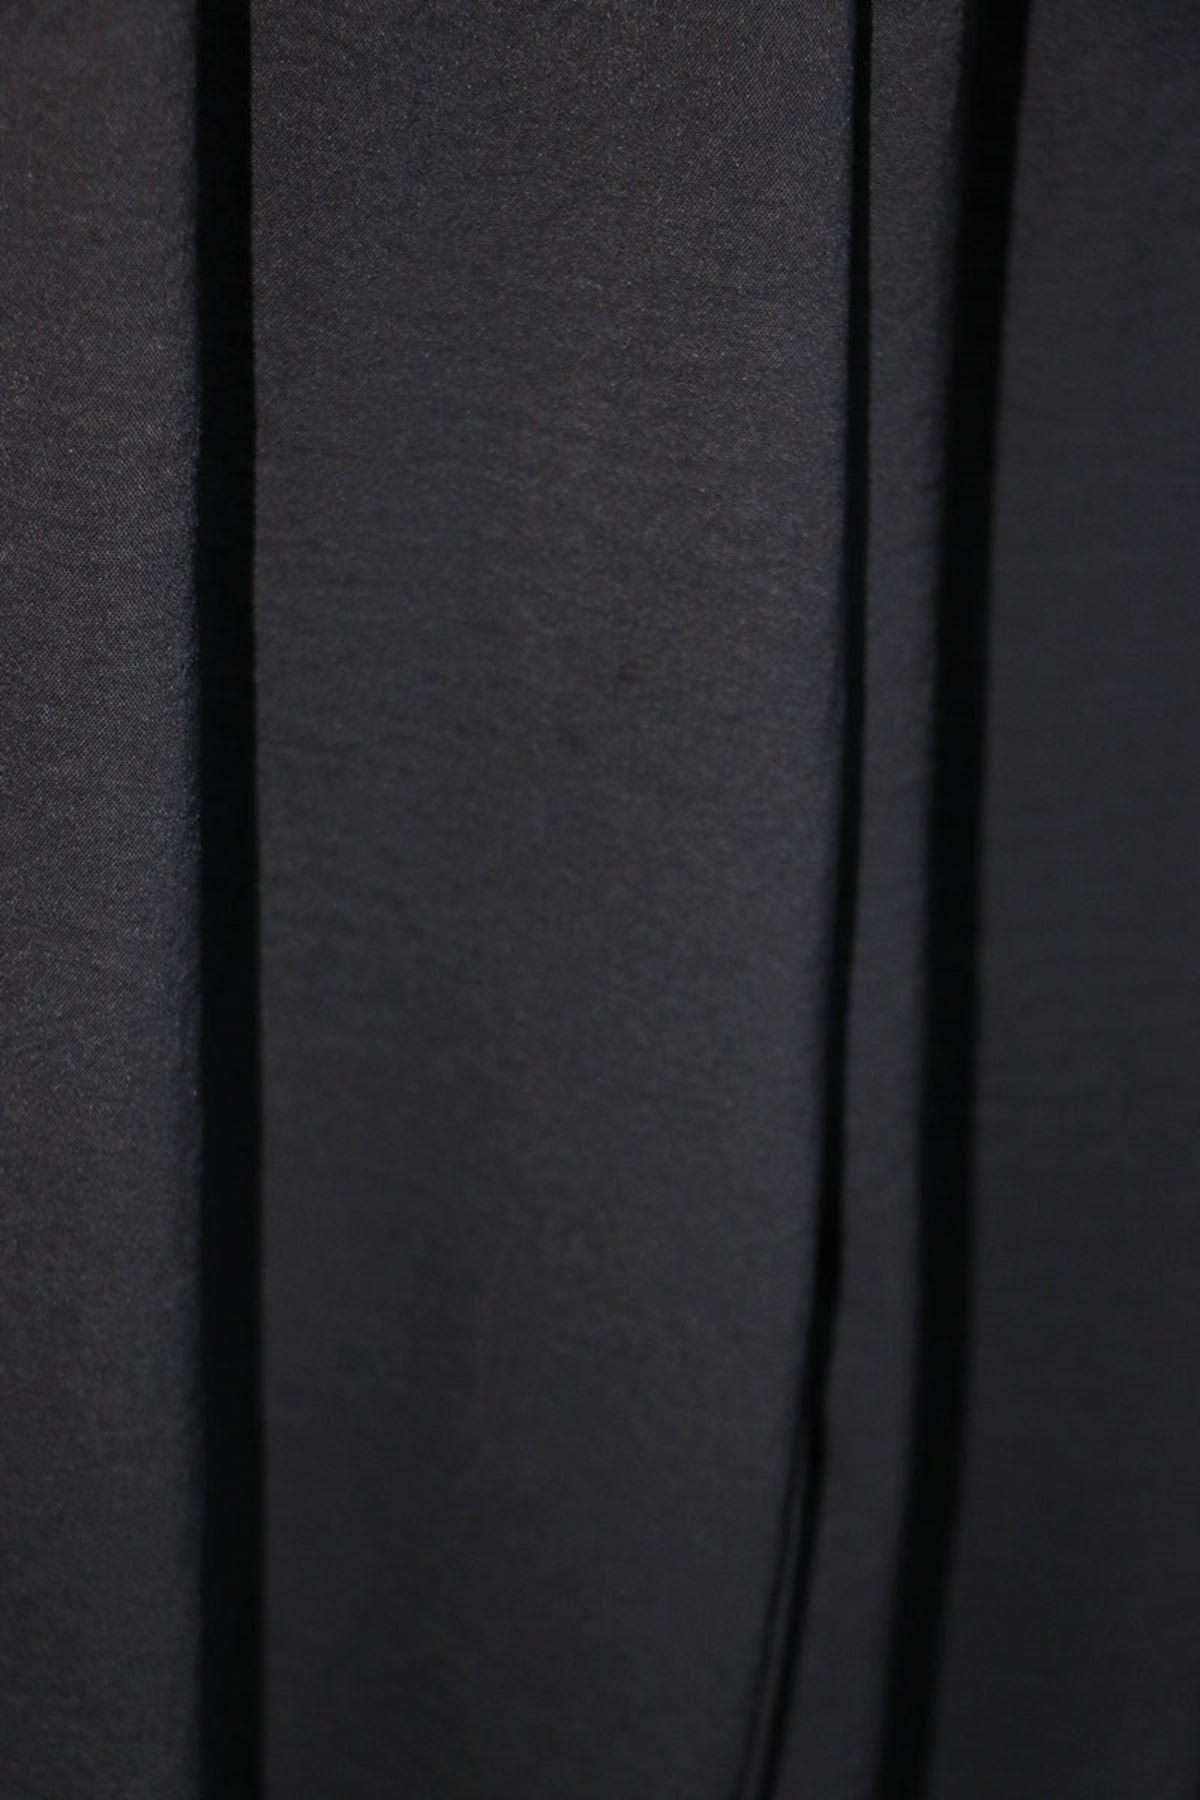 D-27703 Büyük Beden Airobin Çift Kat Pantolon- Siyah